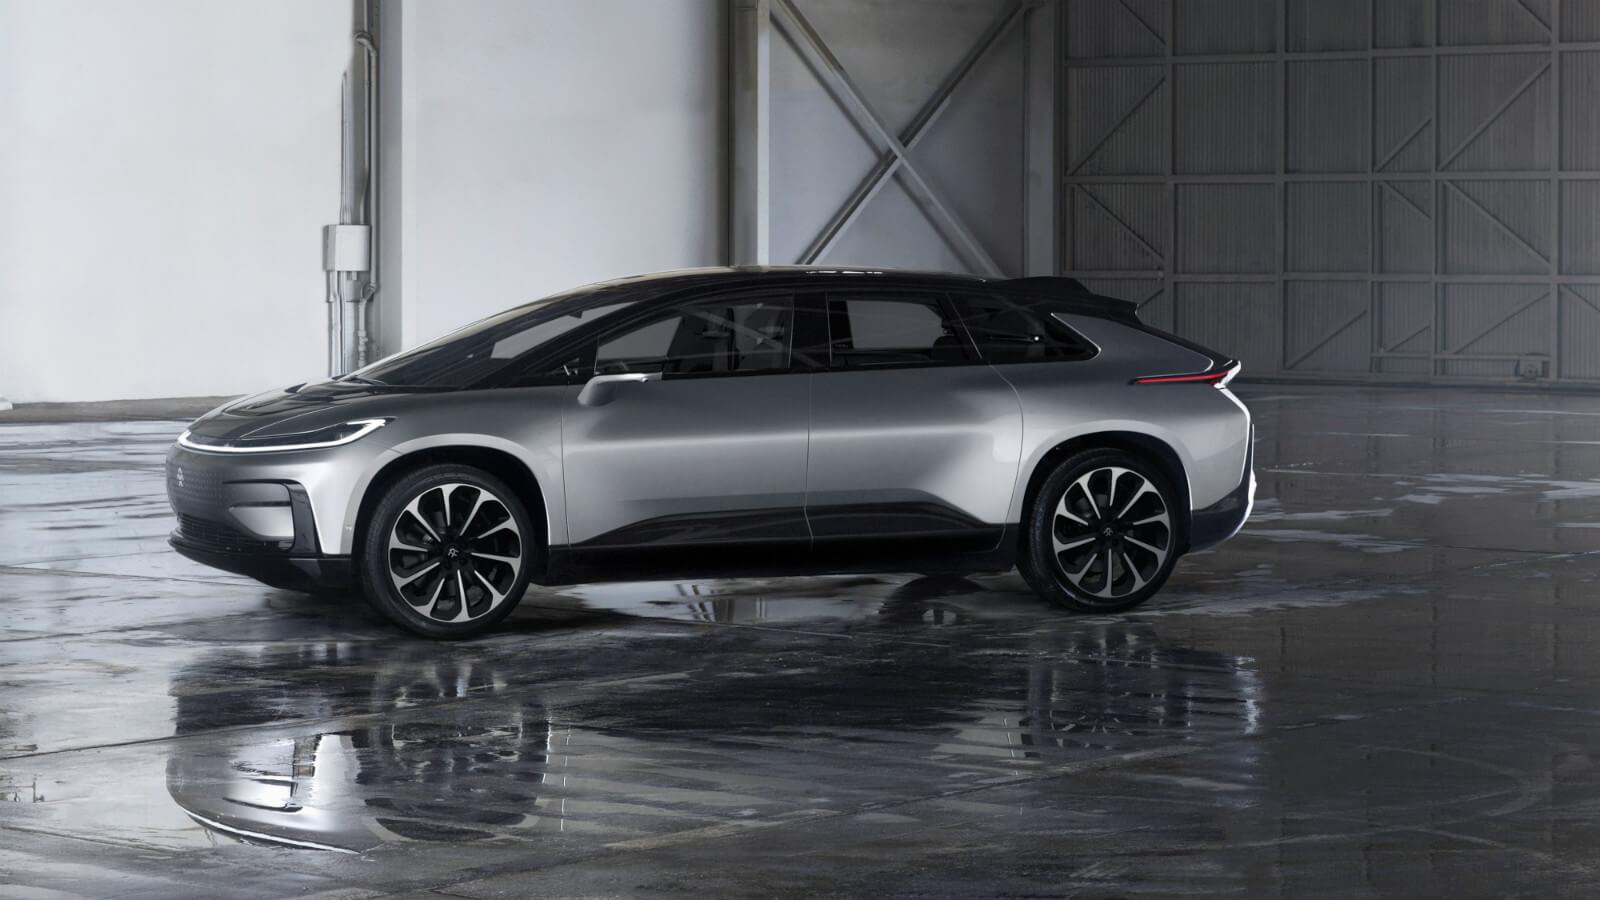 Energii elektromotorům mají poskytovat lithium-iontové baterie s kapacitou 130 kWh od LG Chem. Zdroj: Faraday Future